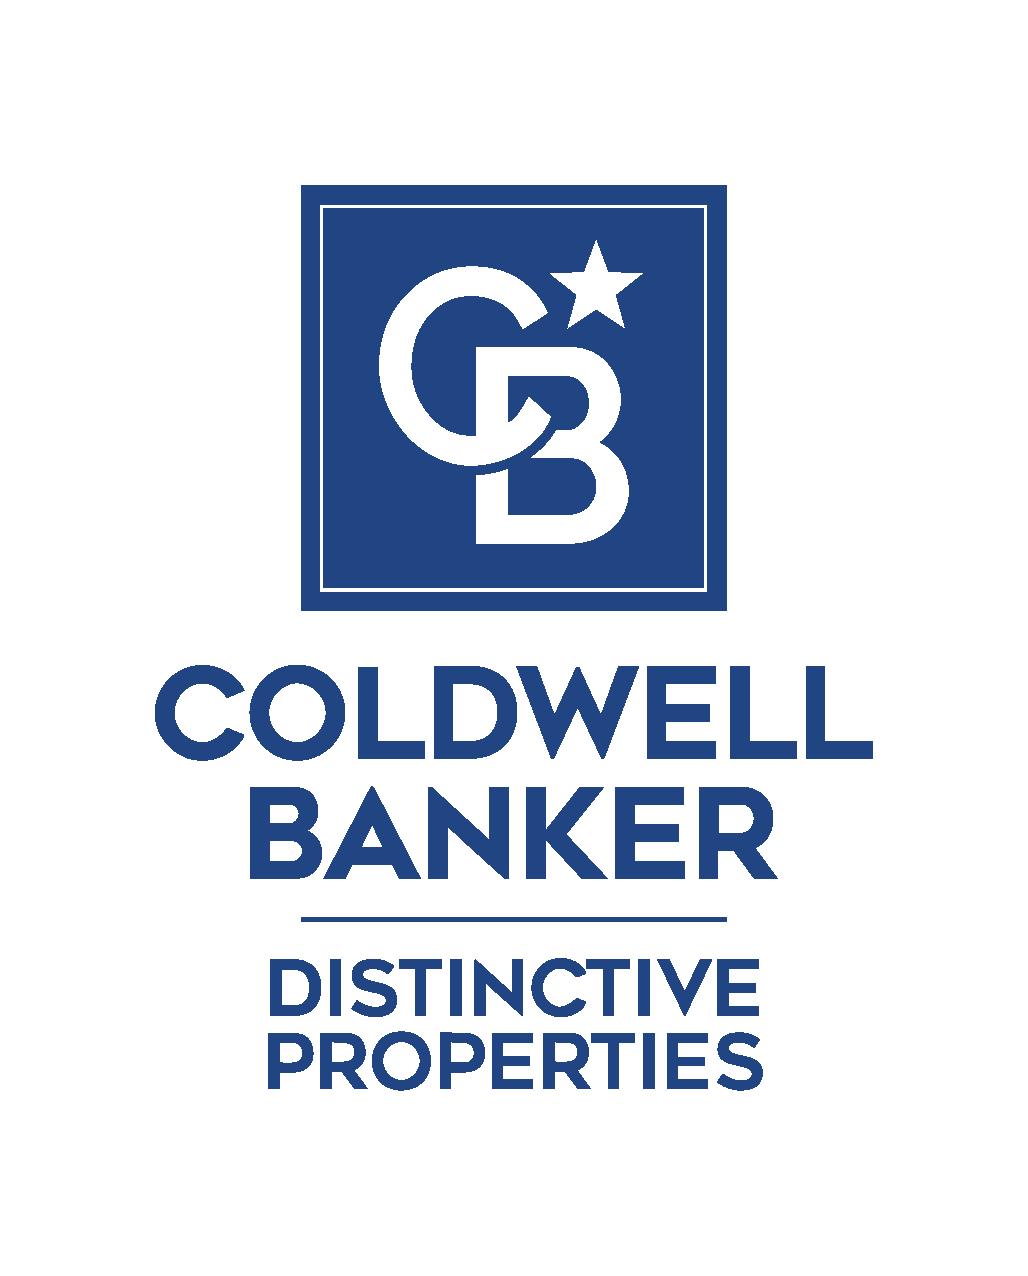 John Anders - Coldwell Banker Distinctive Properties Logo